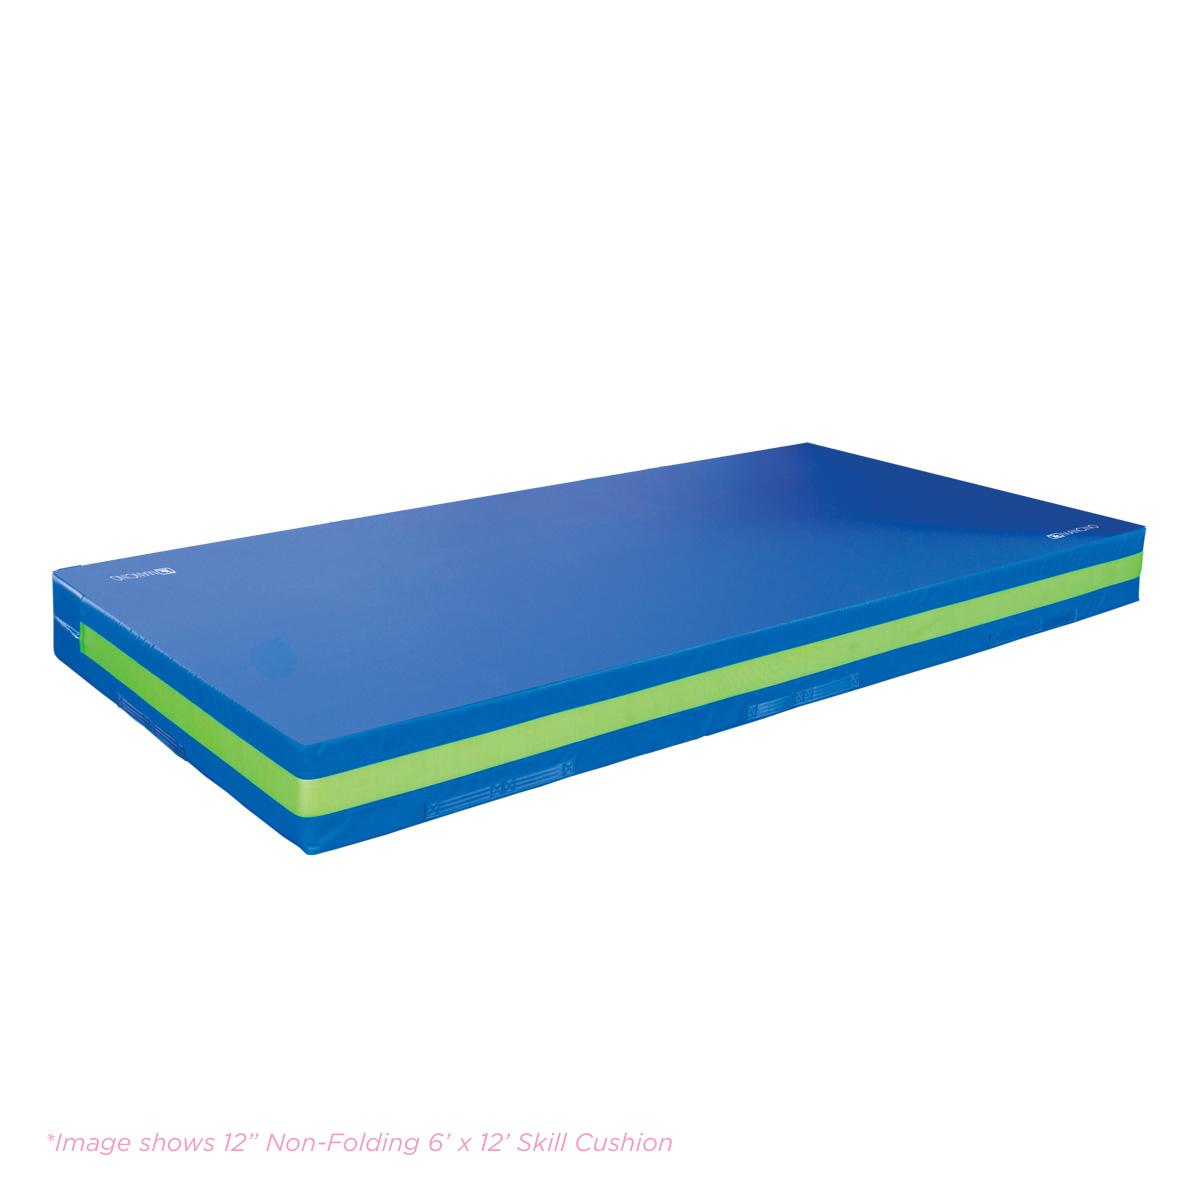 "12"" incher landing mat skill cushion"